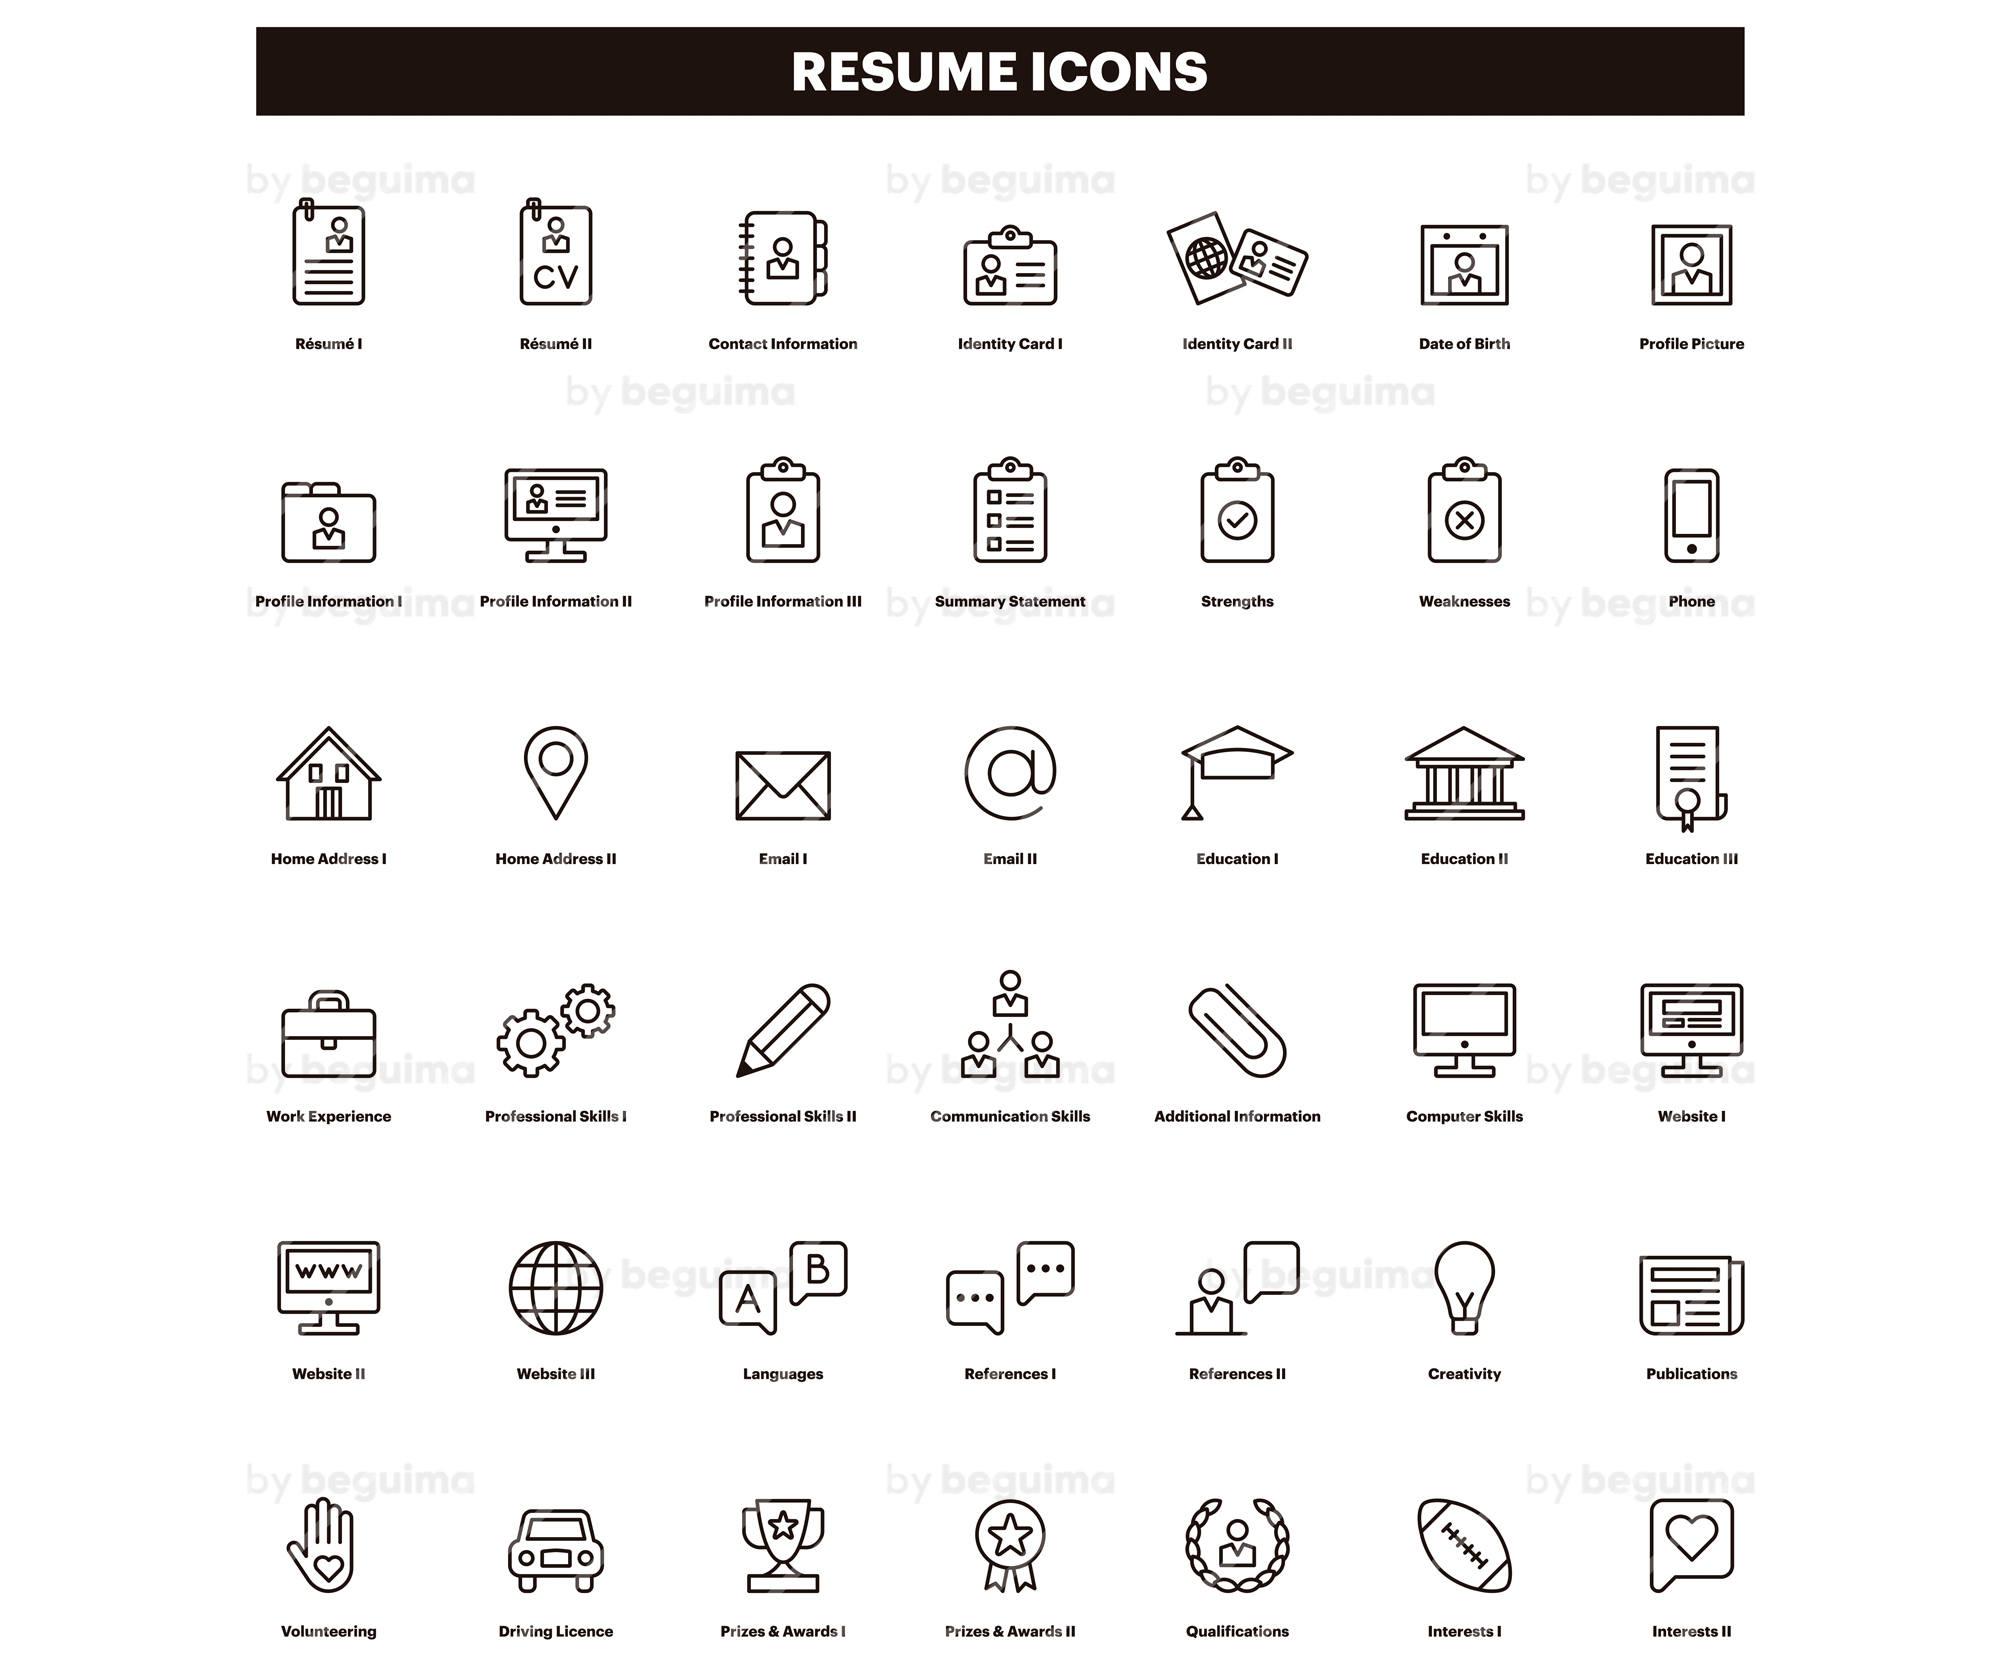 Resume,Icons,CV,Clip Art,Curriculum Vitae,Clipart,Set Of  Icons,Line,Linear,Black,Outline,Minimalist,Vector File,Eps,Jpg,Png,Digital  Download.